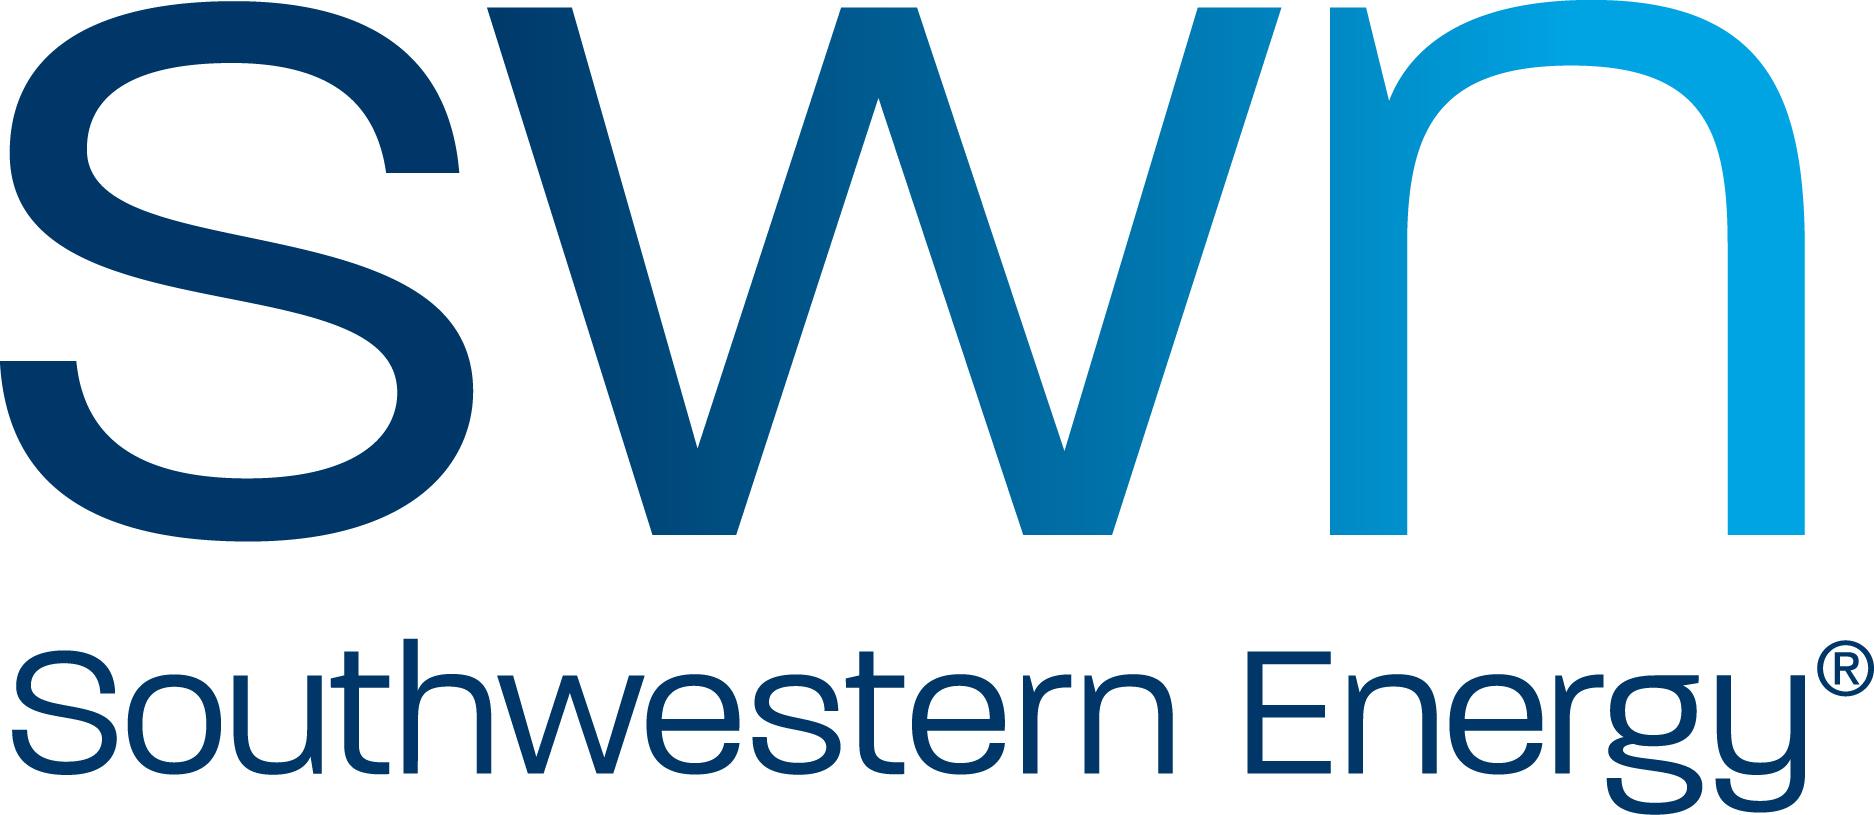 Southwestern_Energy_logo (1).jpg